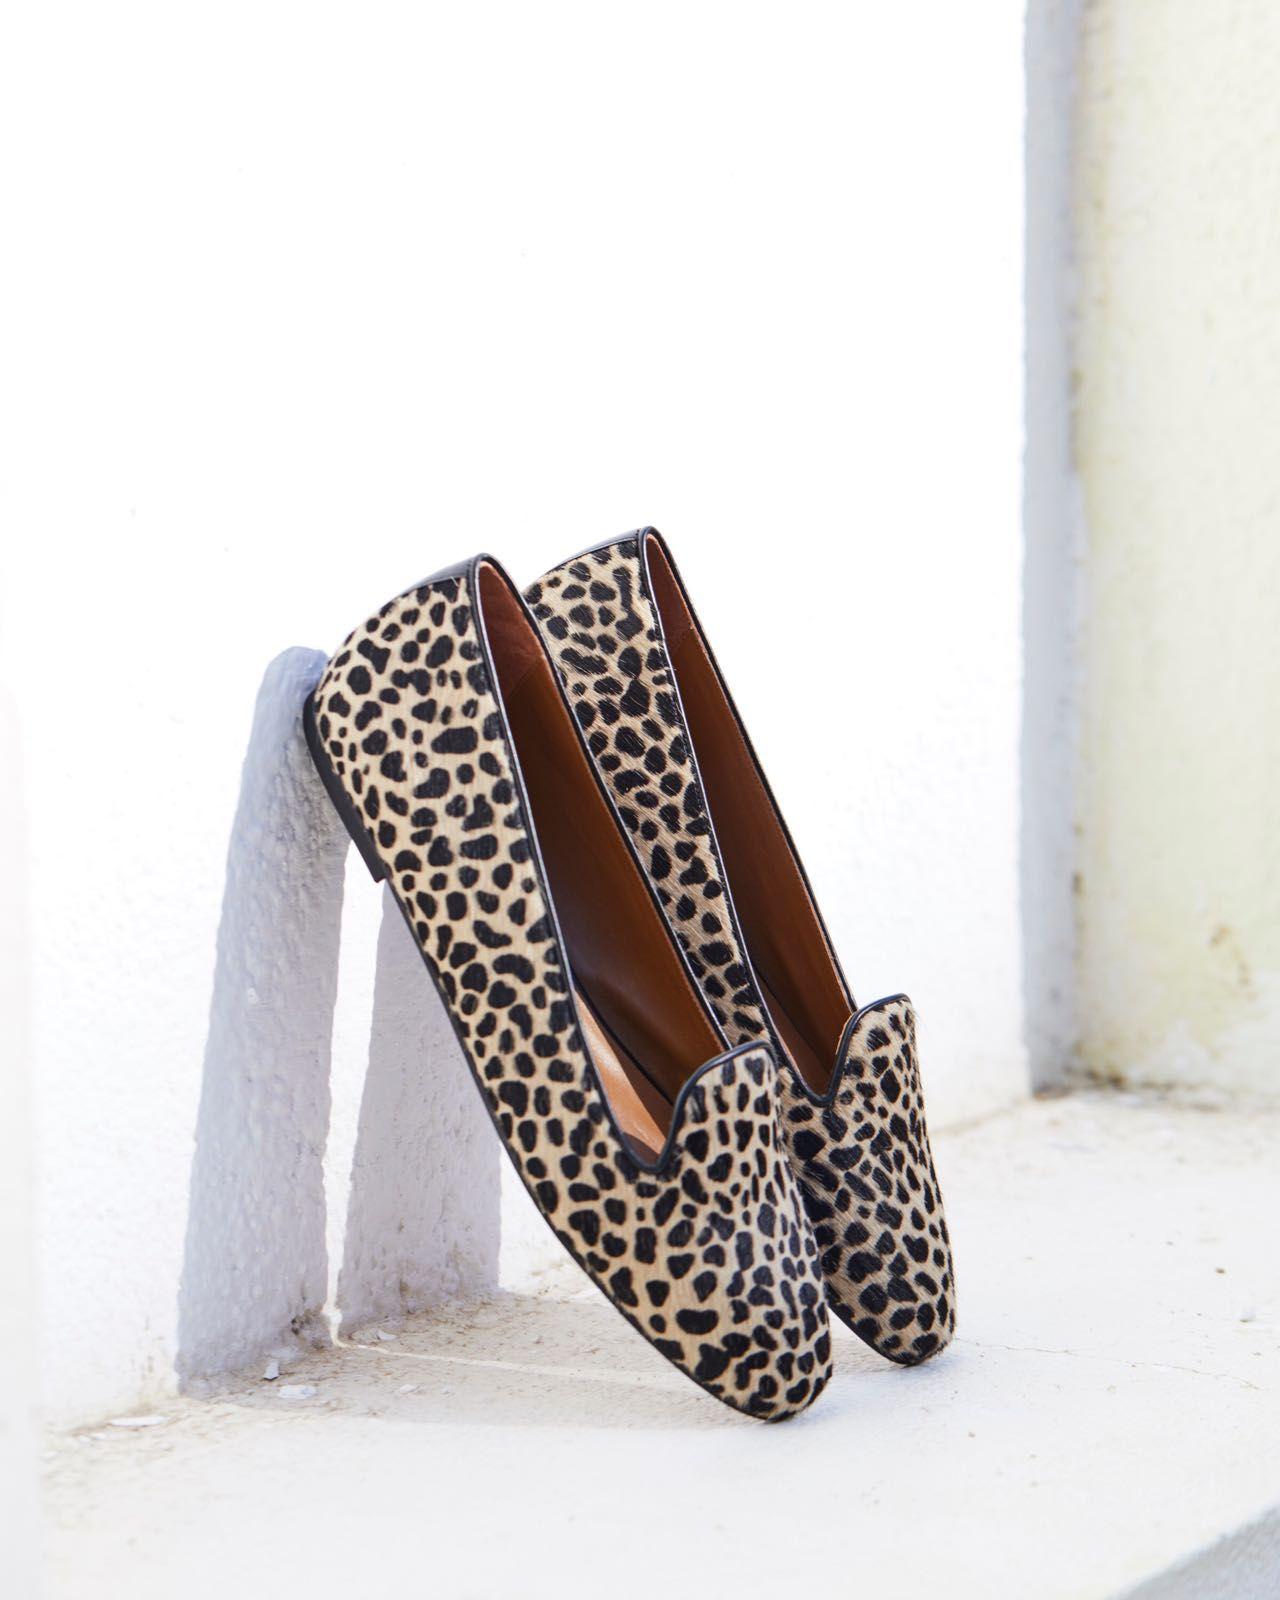 5d7f3dfe Mislitas Enma ya disponibles en OUTLET #calzado #flatshoes ...